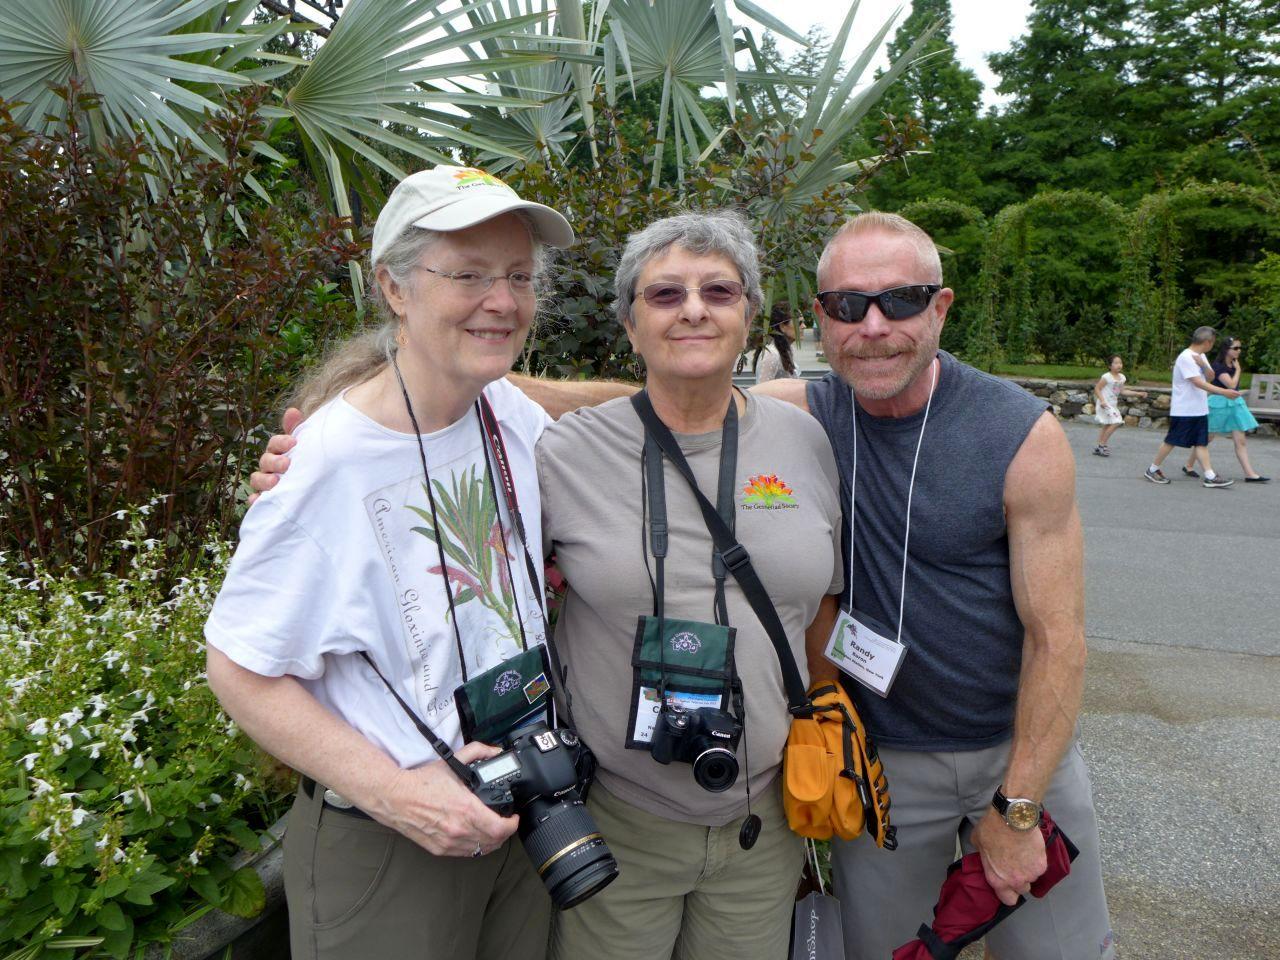 Julie Mavity-Hudson, Carol Ann Bonner and Randy Baron